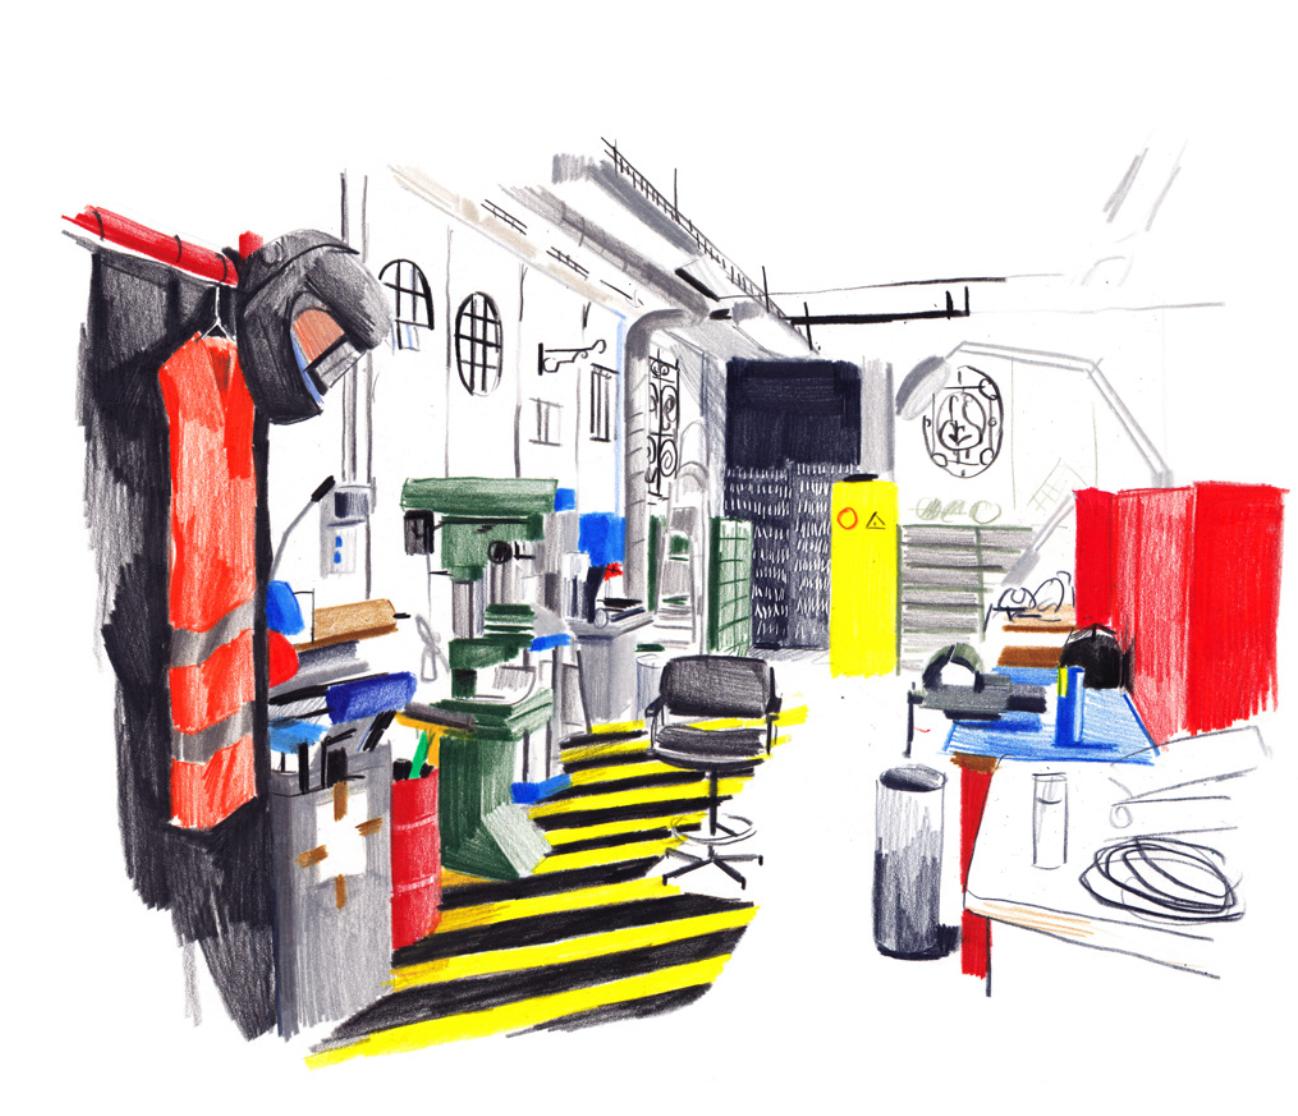 L'atelier Serrurerie | GALERIE TREIZE-DIX I LUCILE PIKETTY | L'atelier Serrurerie